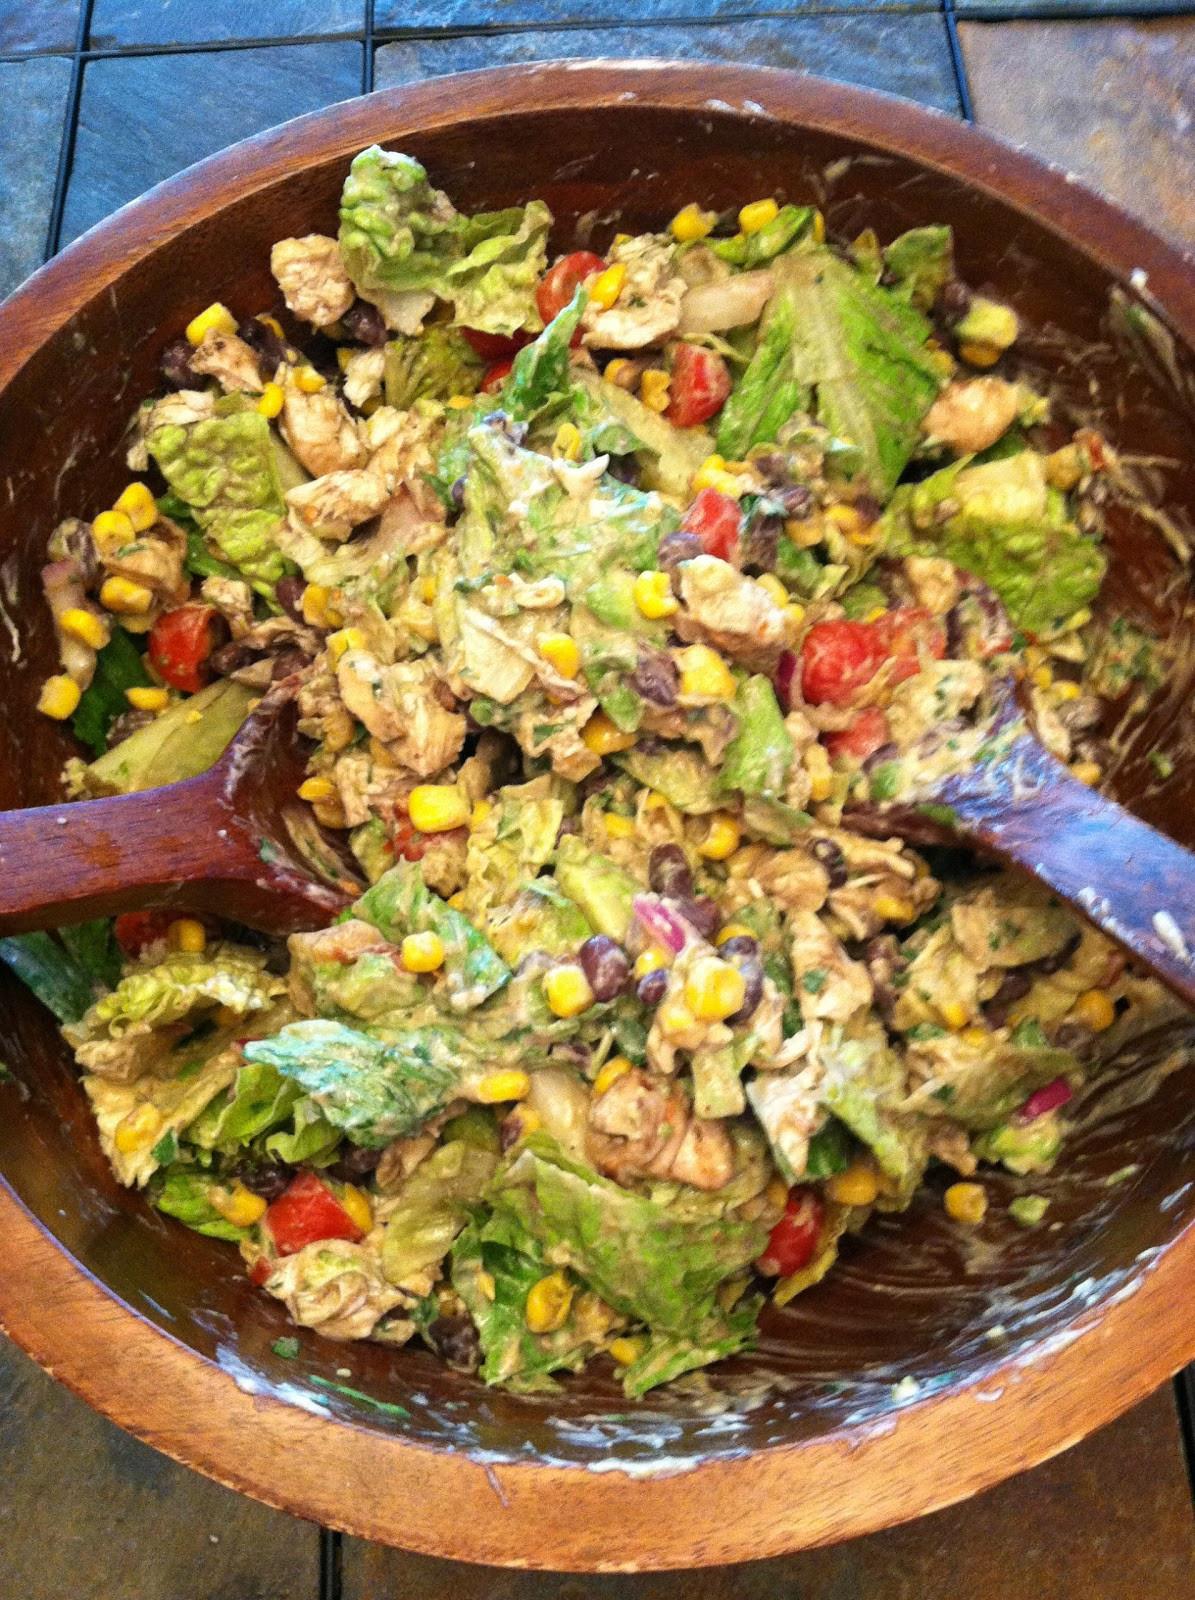 Chipotle Chicken Salad  Coast to Closet Chipotle Chicken Salad